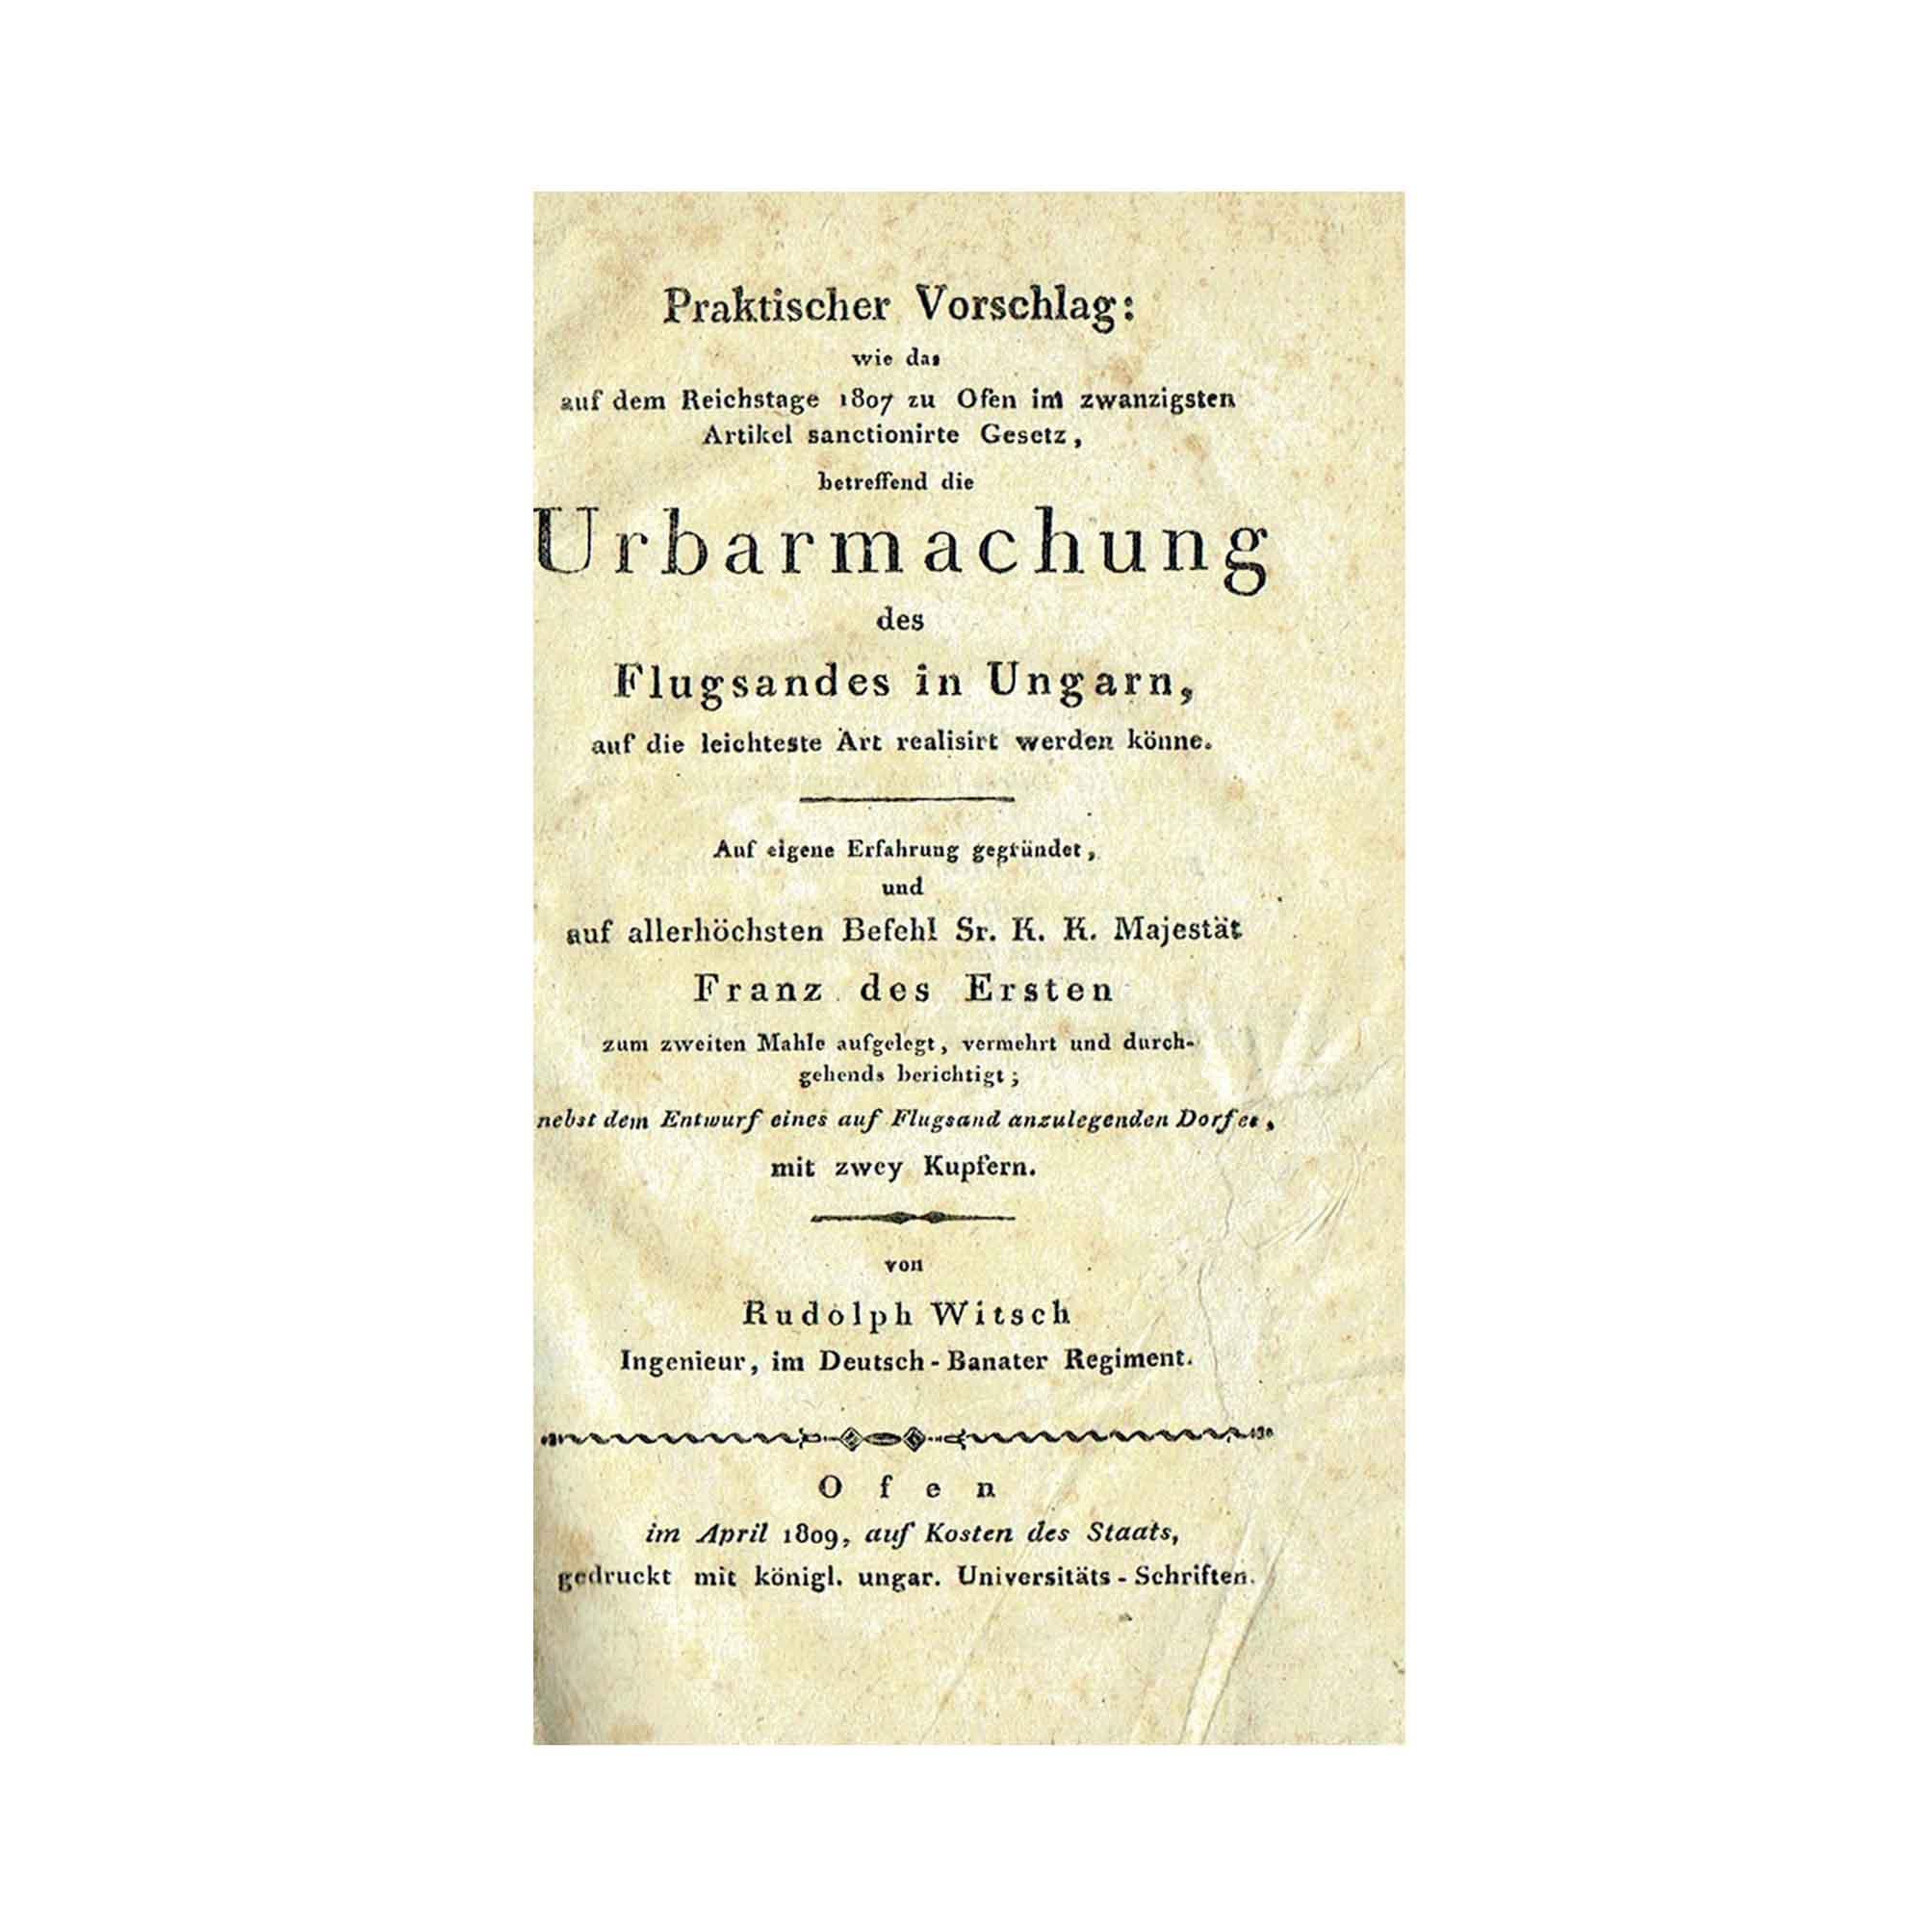 5795-Witsch-Flugsand-1809-Titelblatt-A-N.jpg